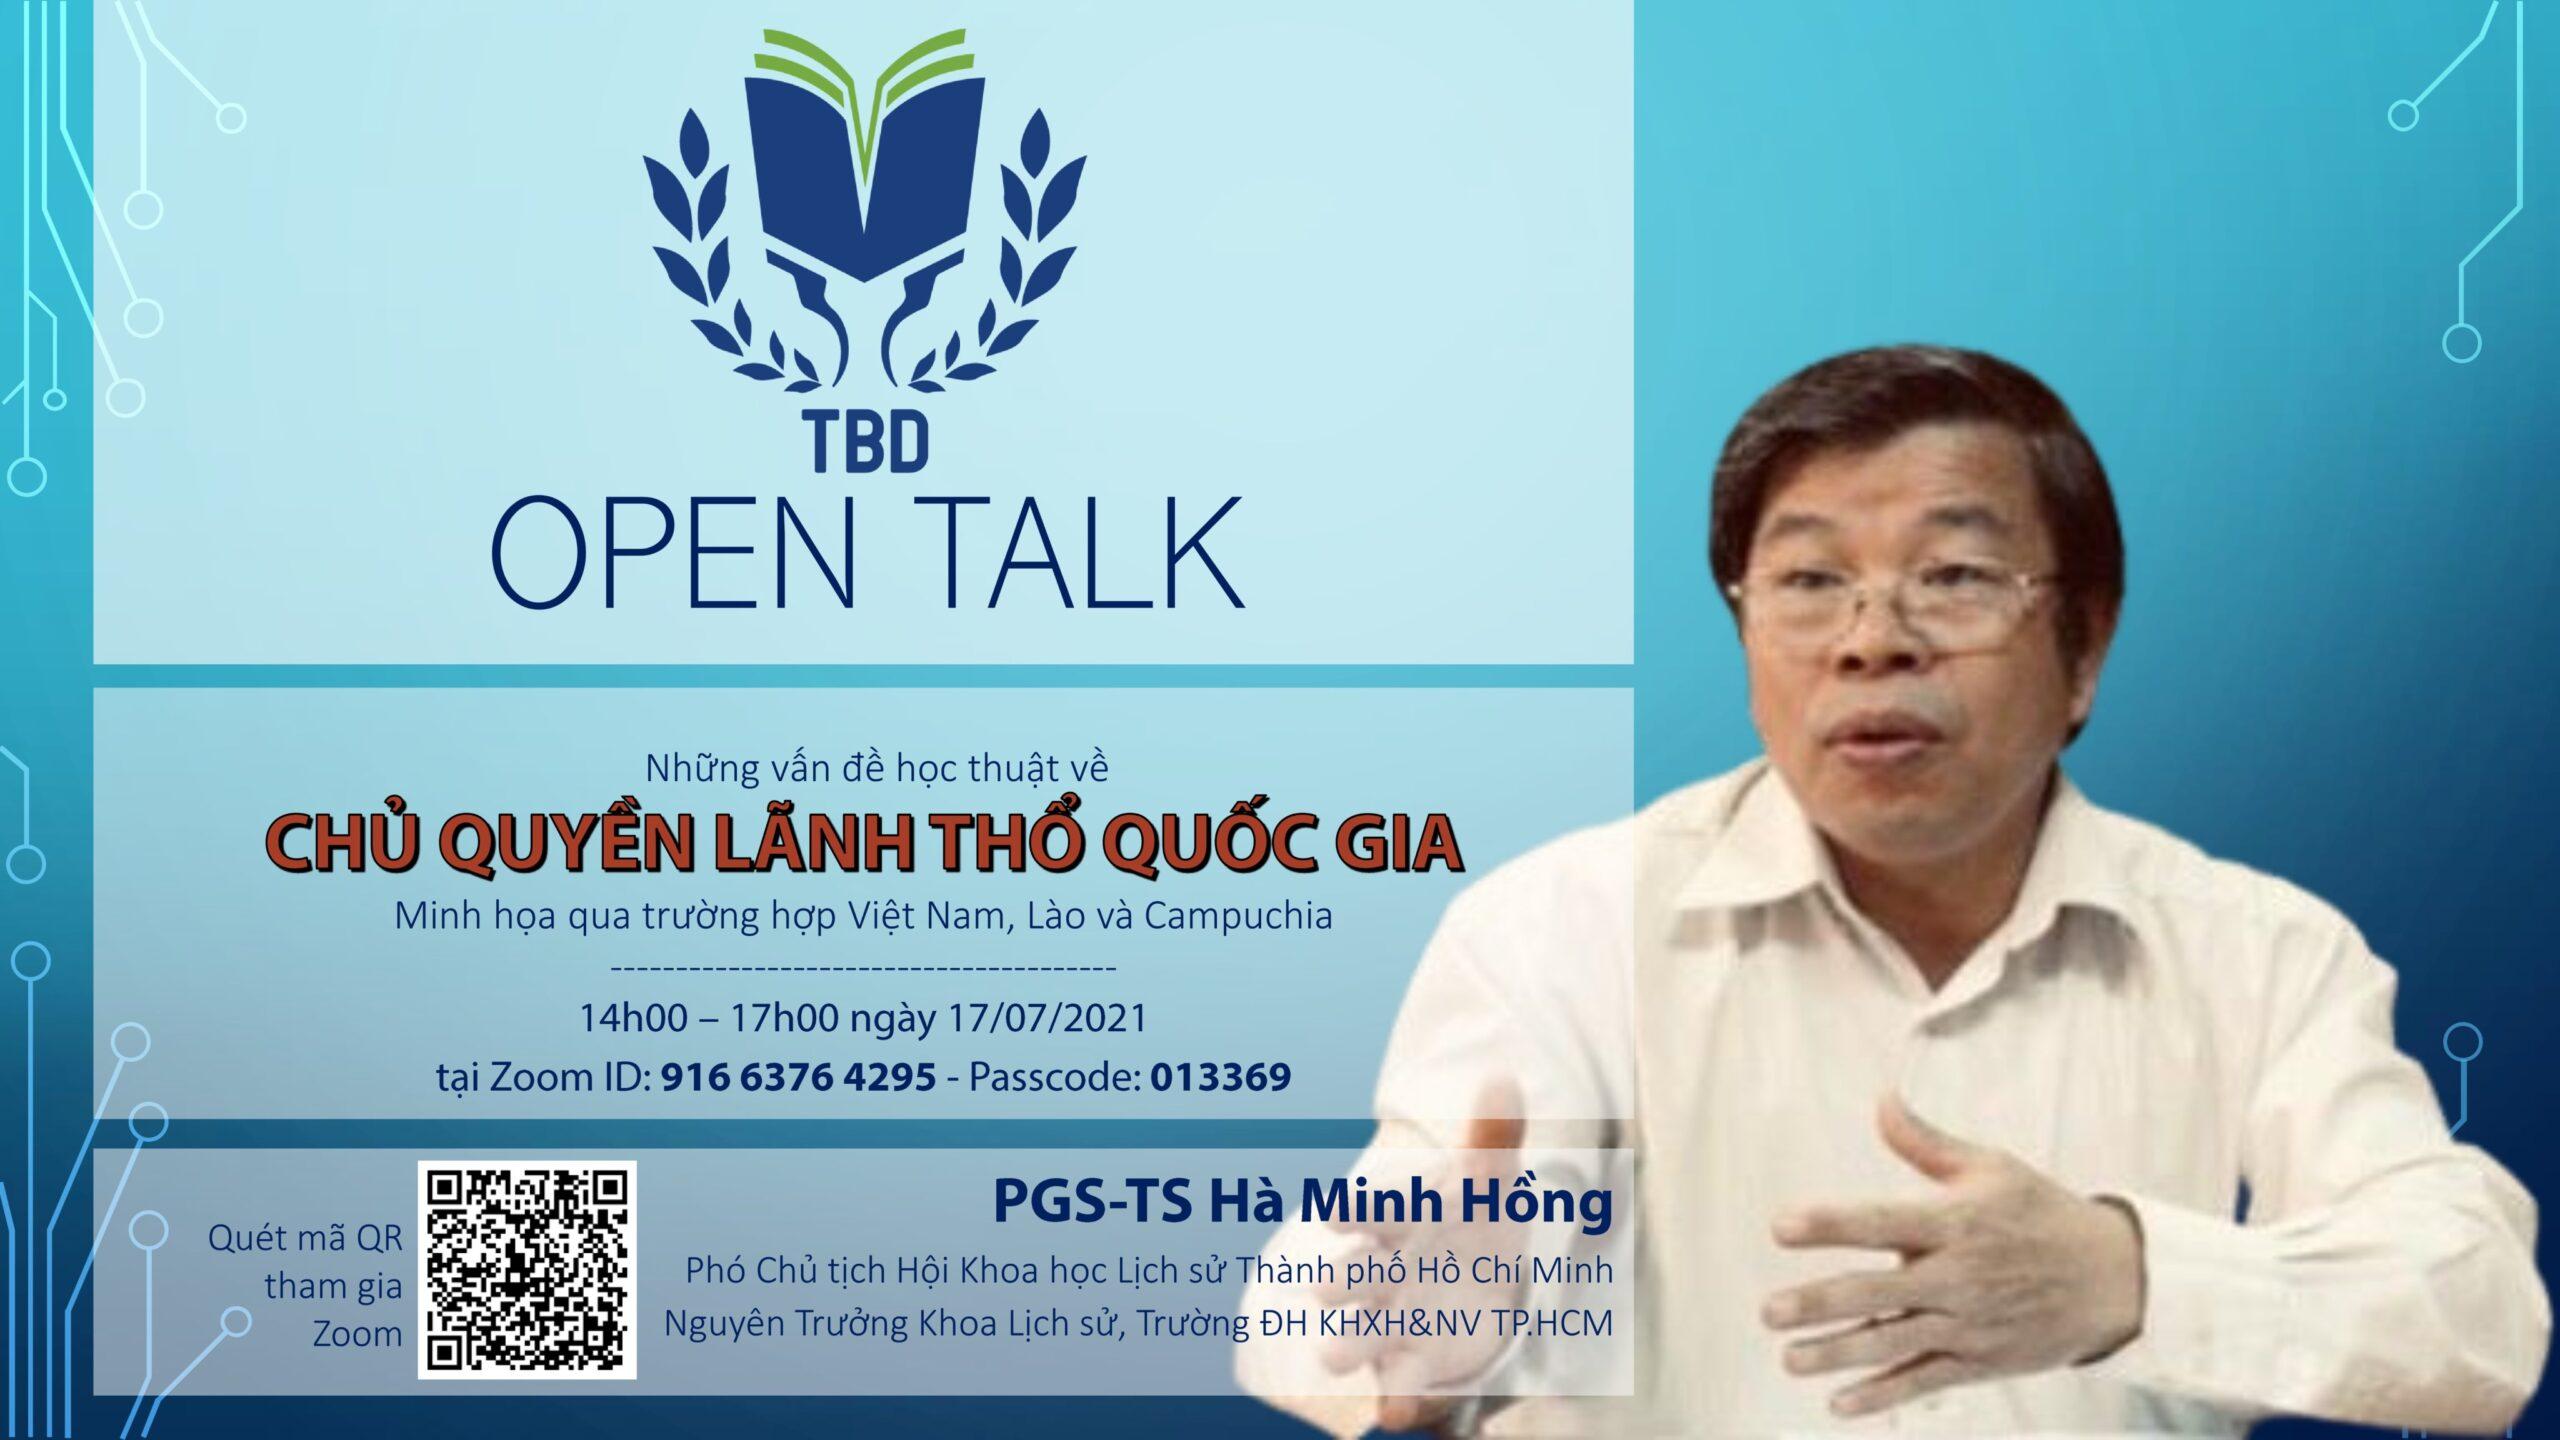 TBD Open talk